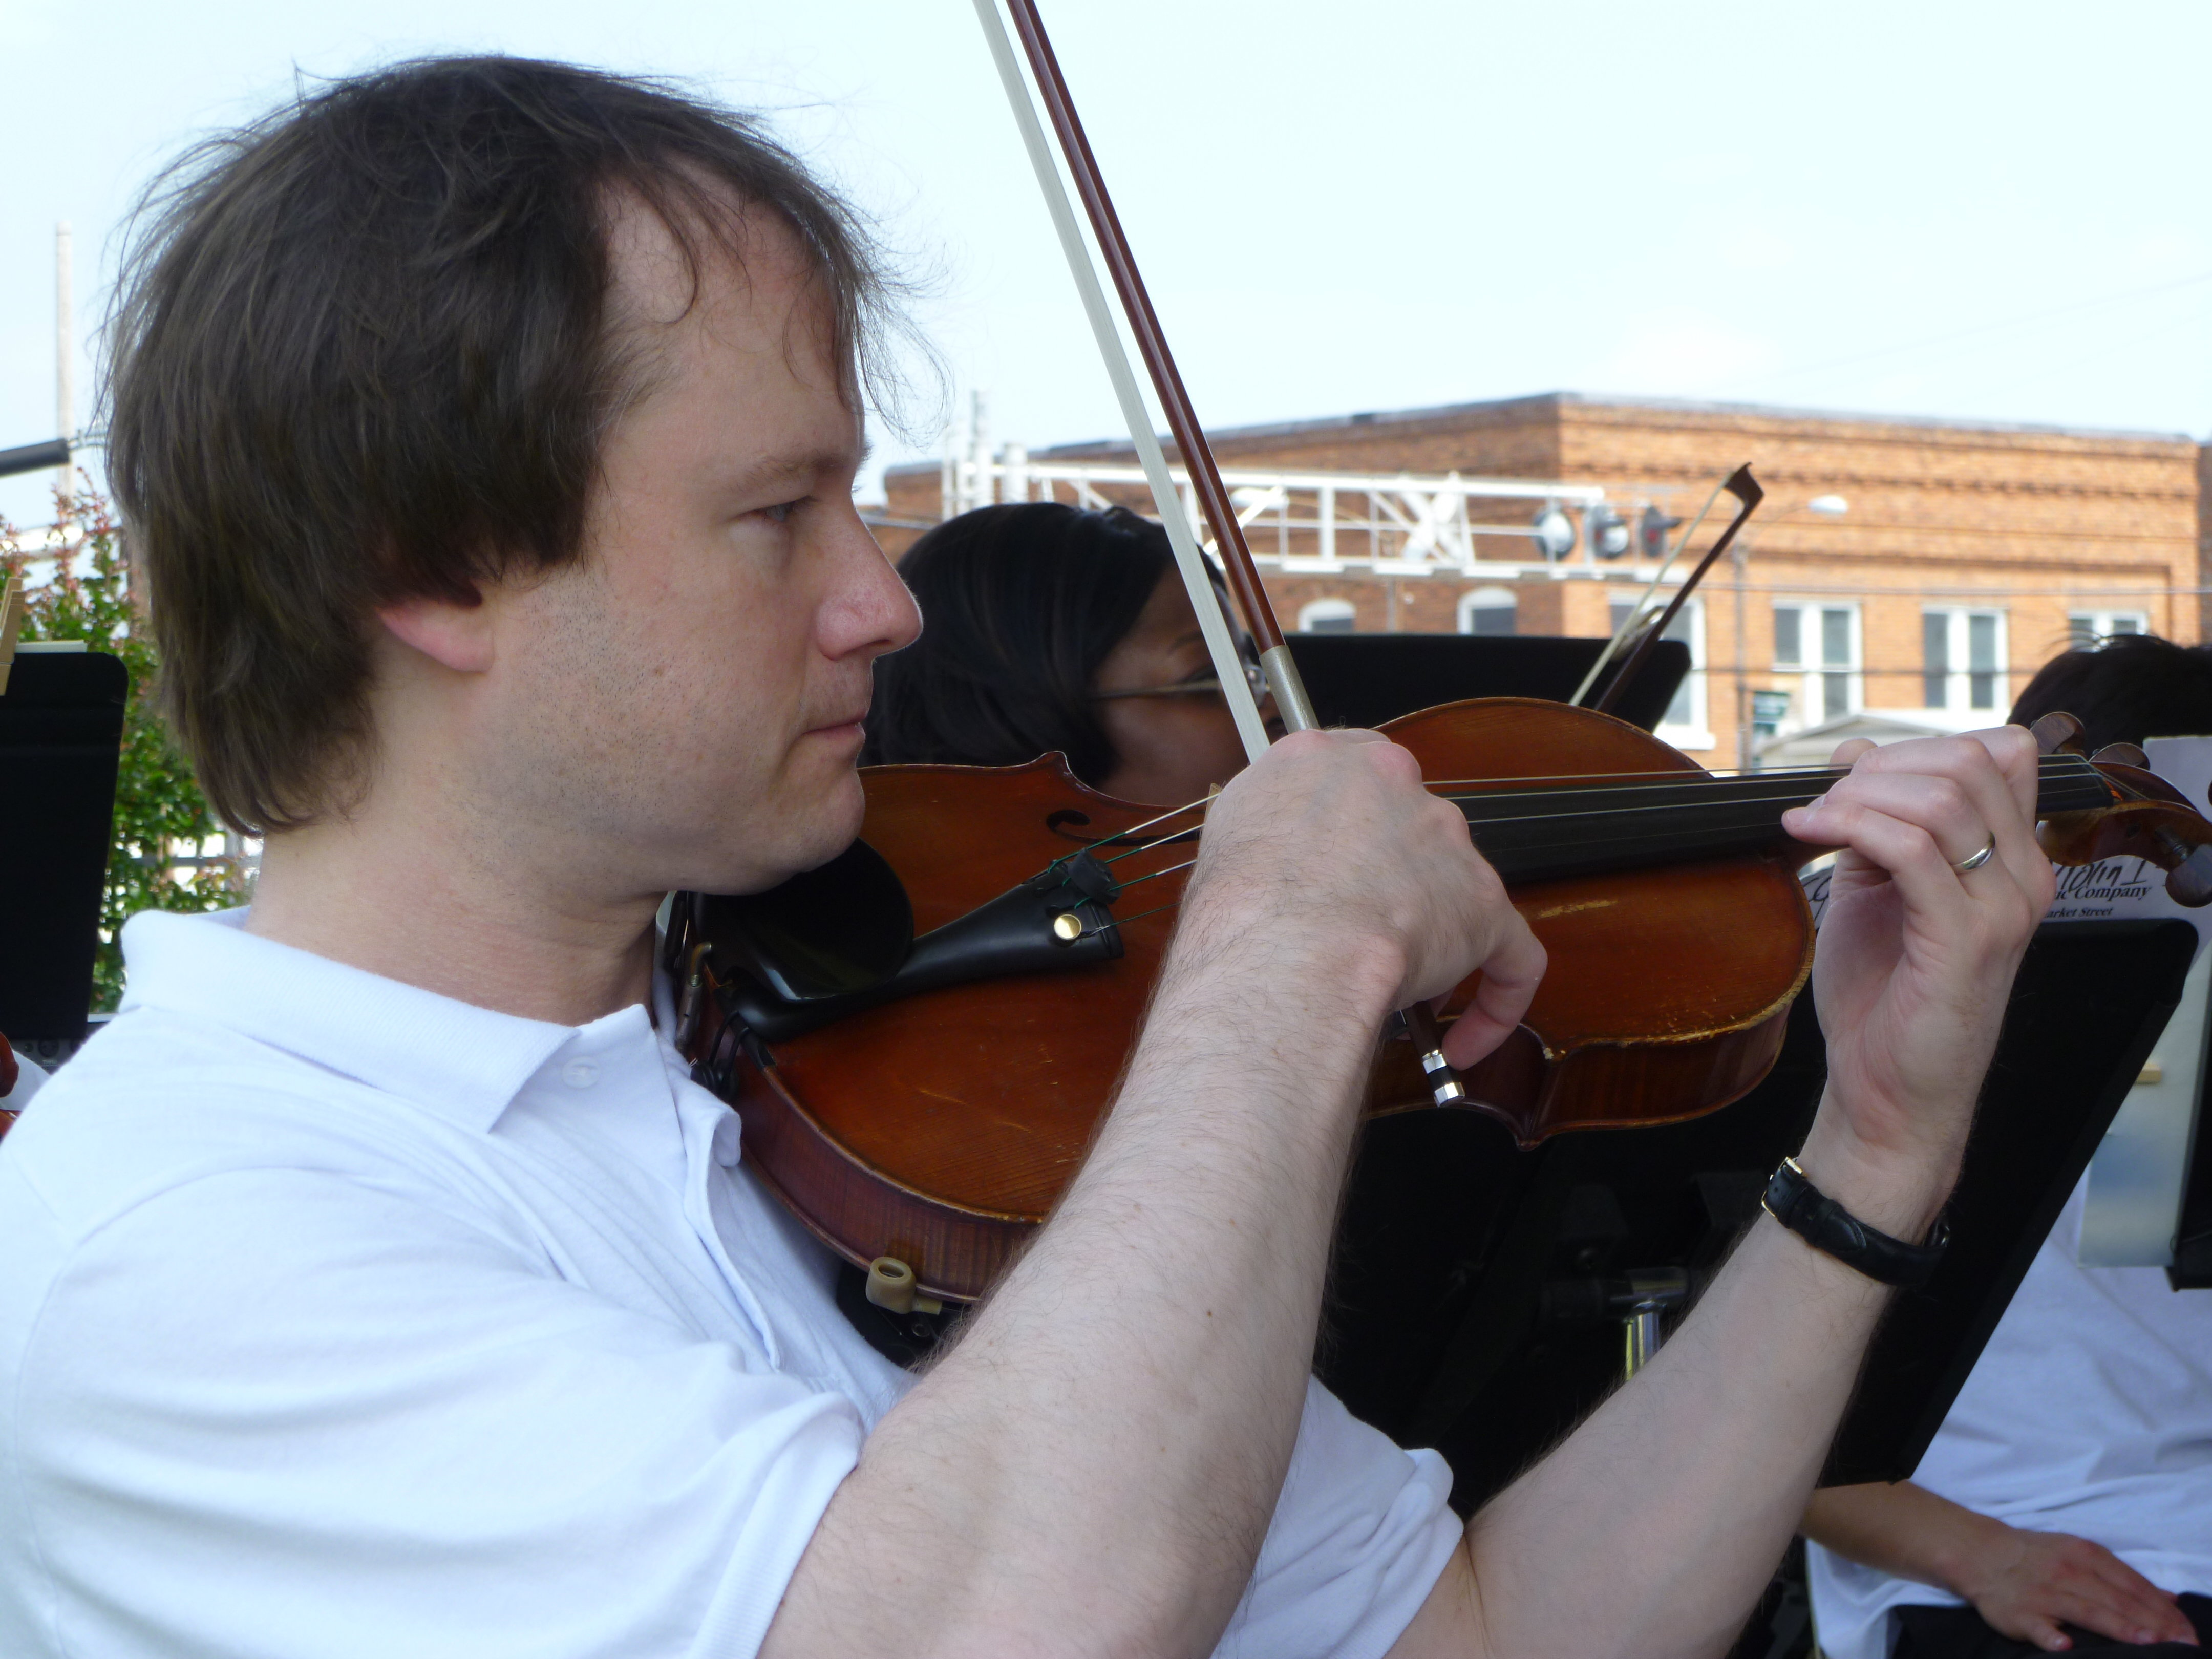 Ueli concertmaster